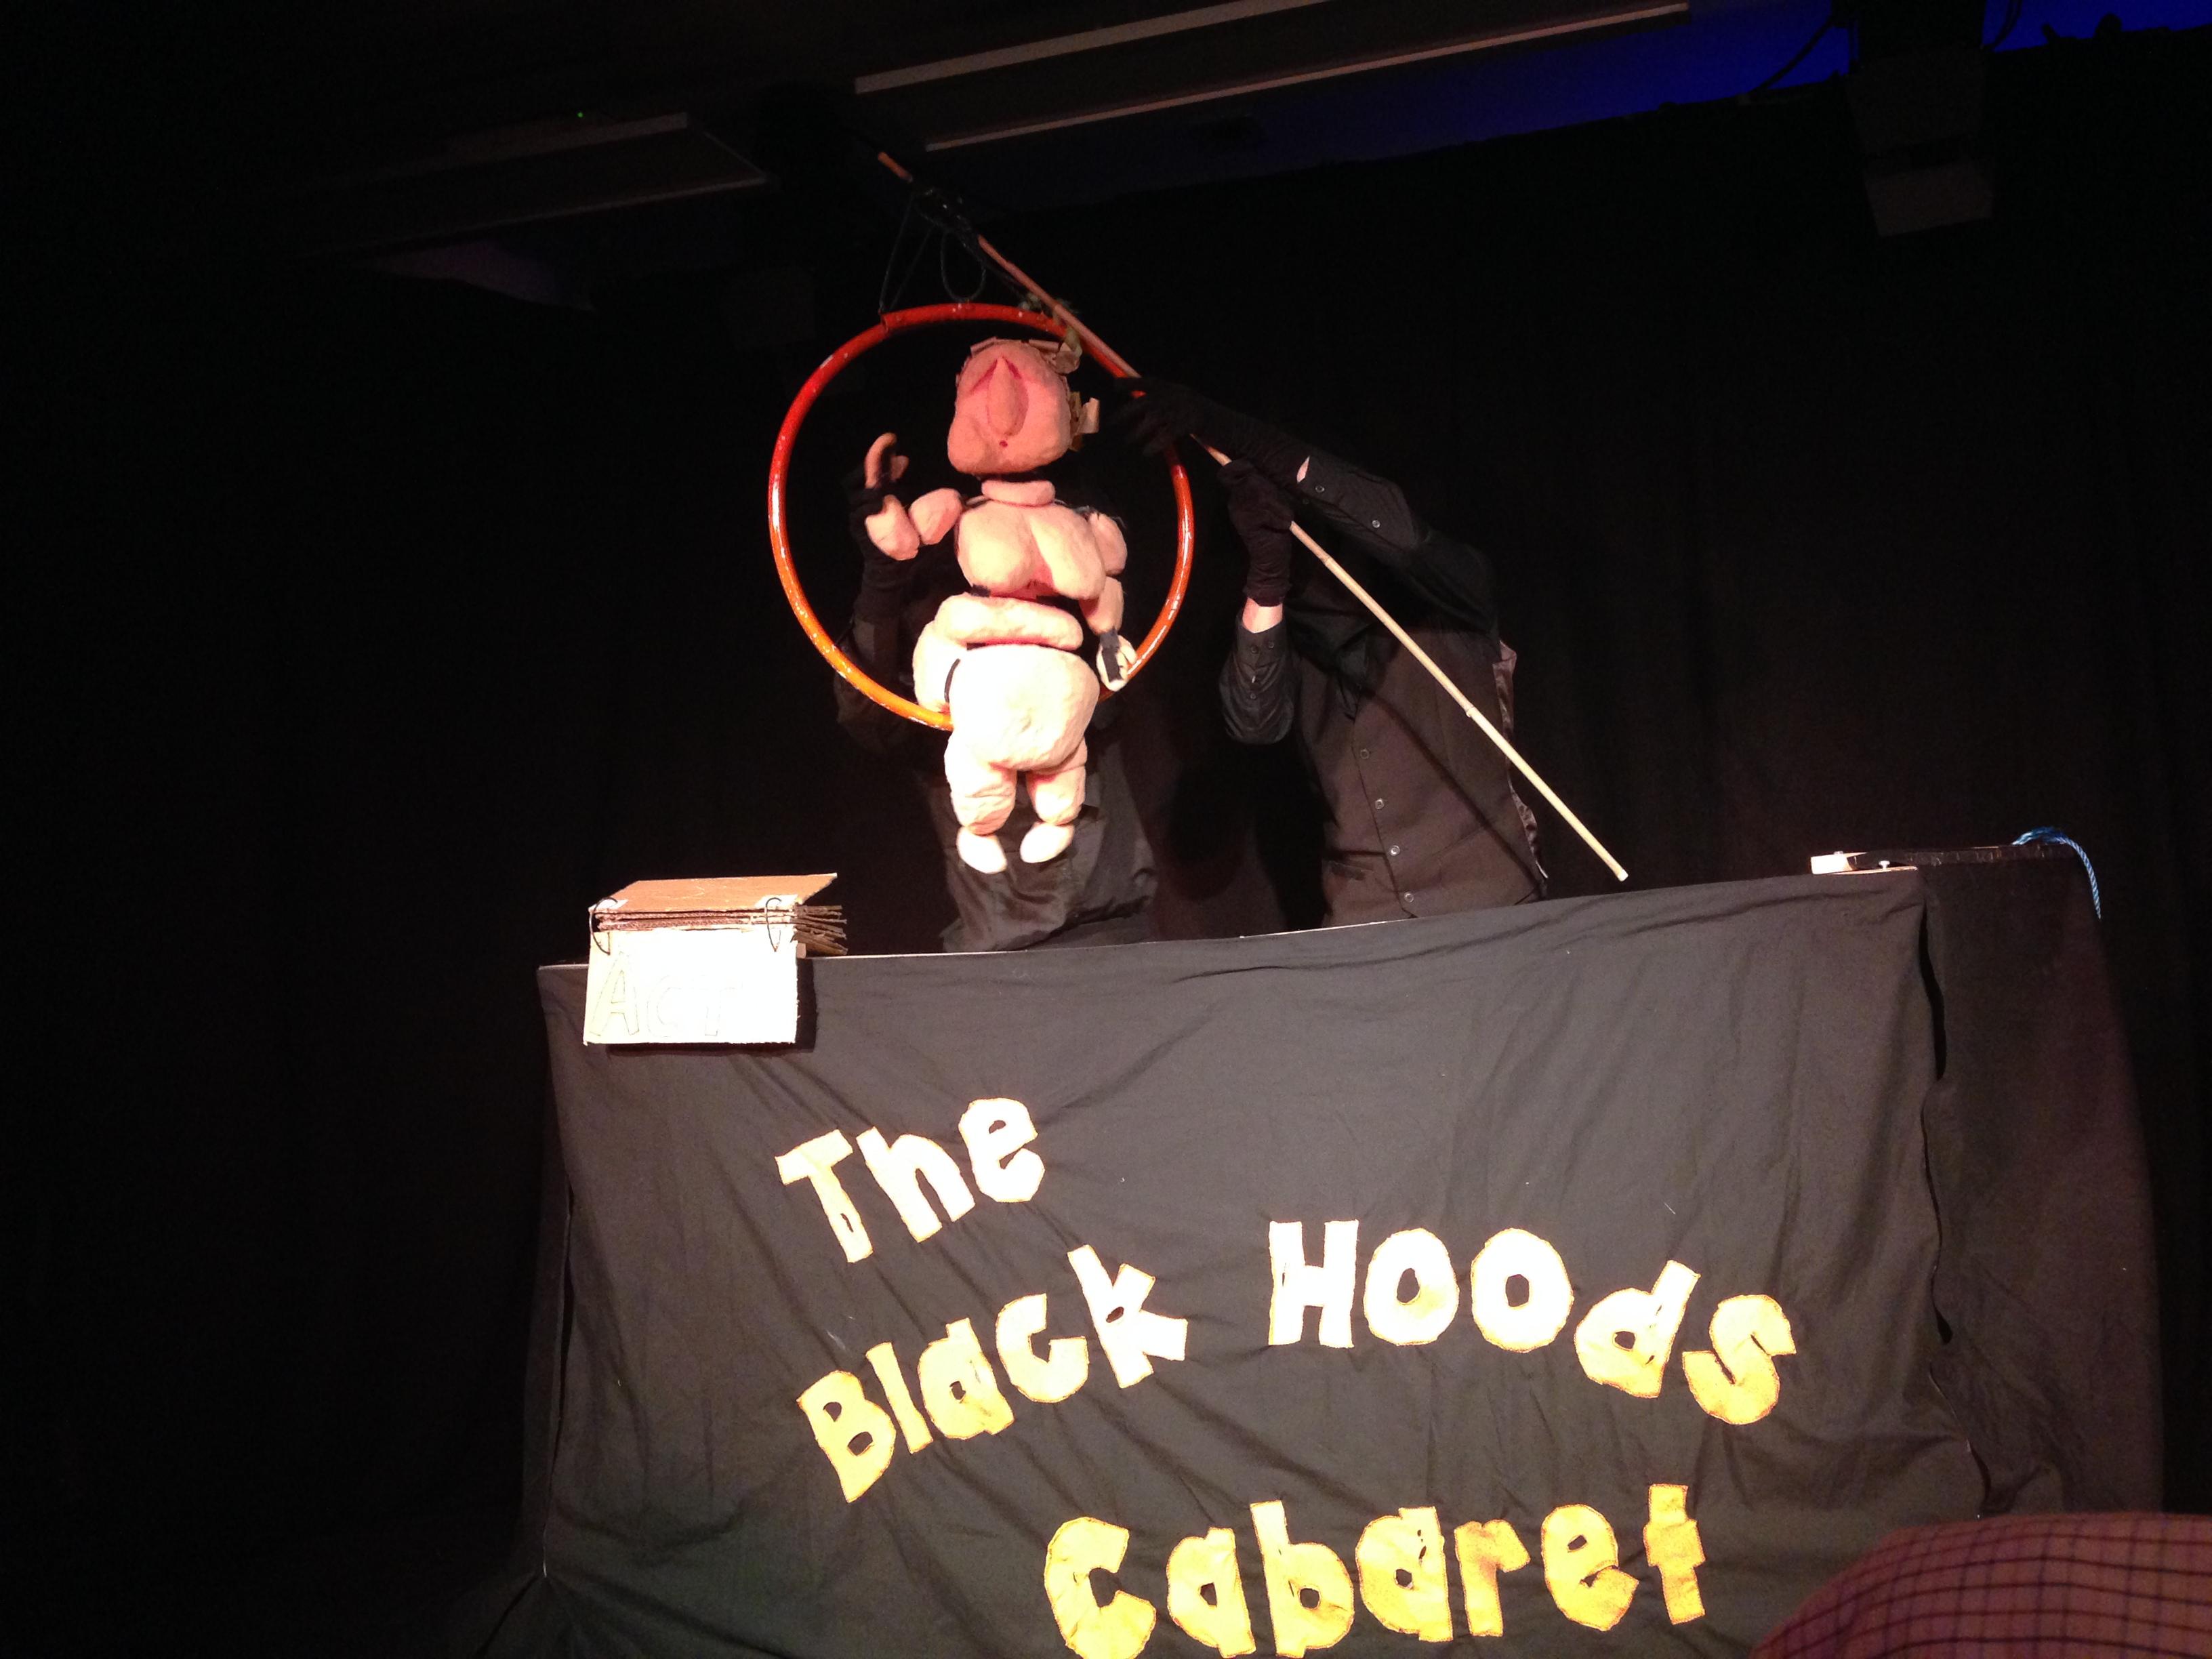 Edinburgh Fringe Review: Black Hoods Cabaret